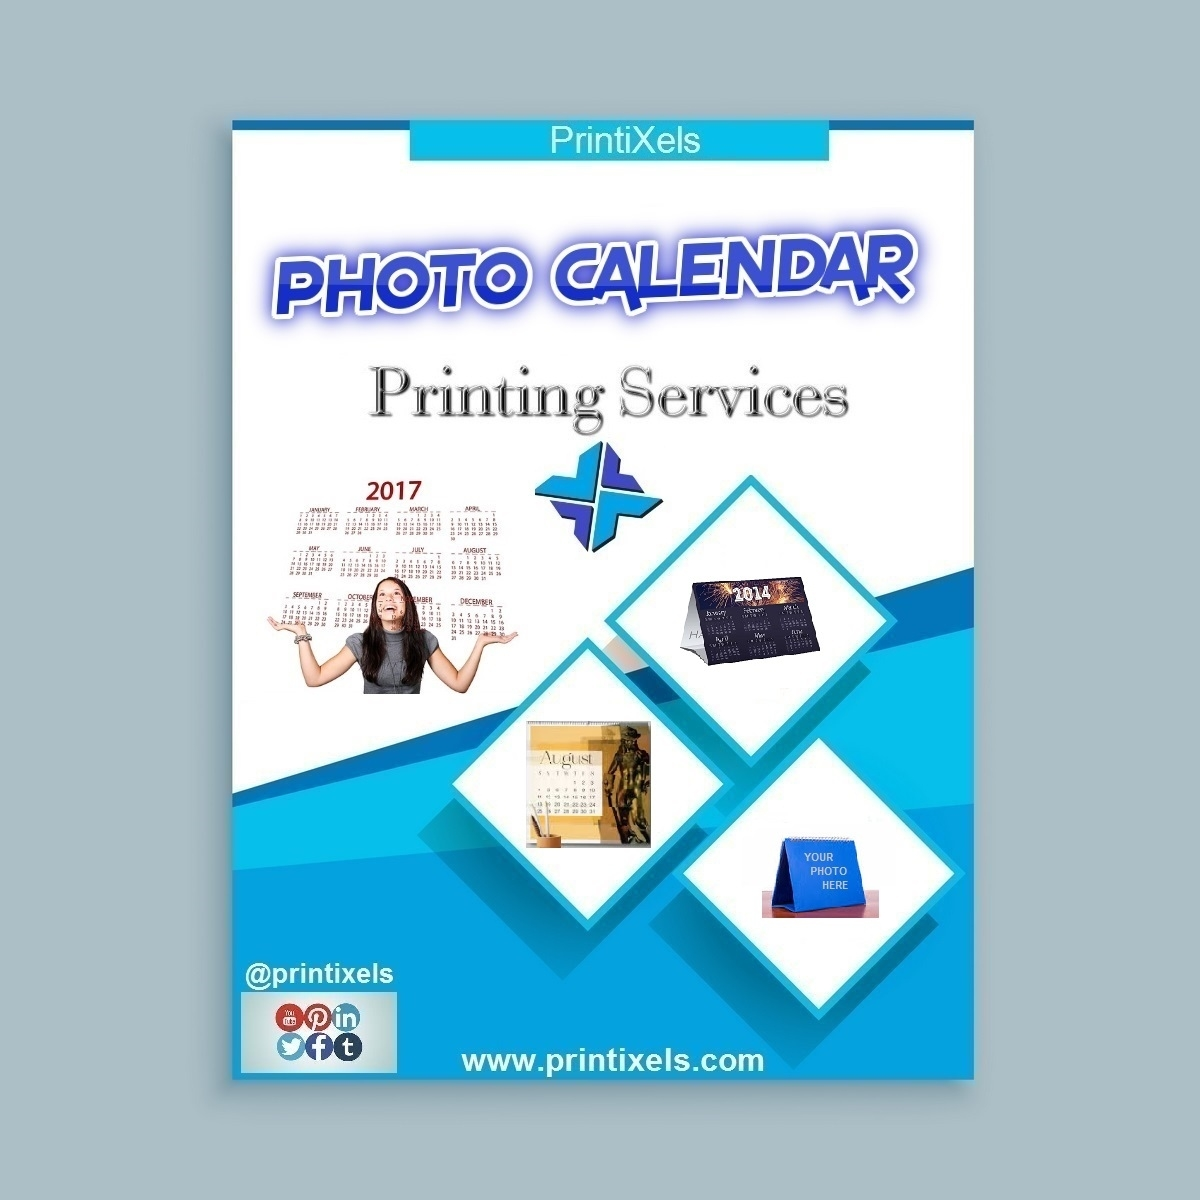 Photo Calendar Printing Services | Printixels™ Philippines The Calendar Printing Company